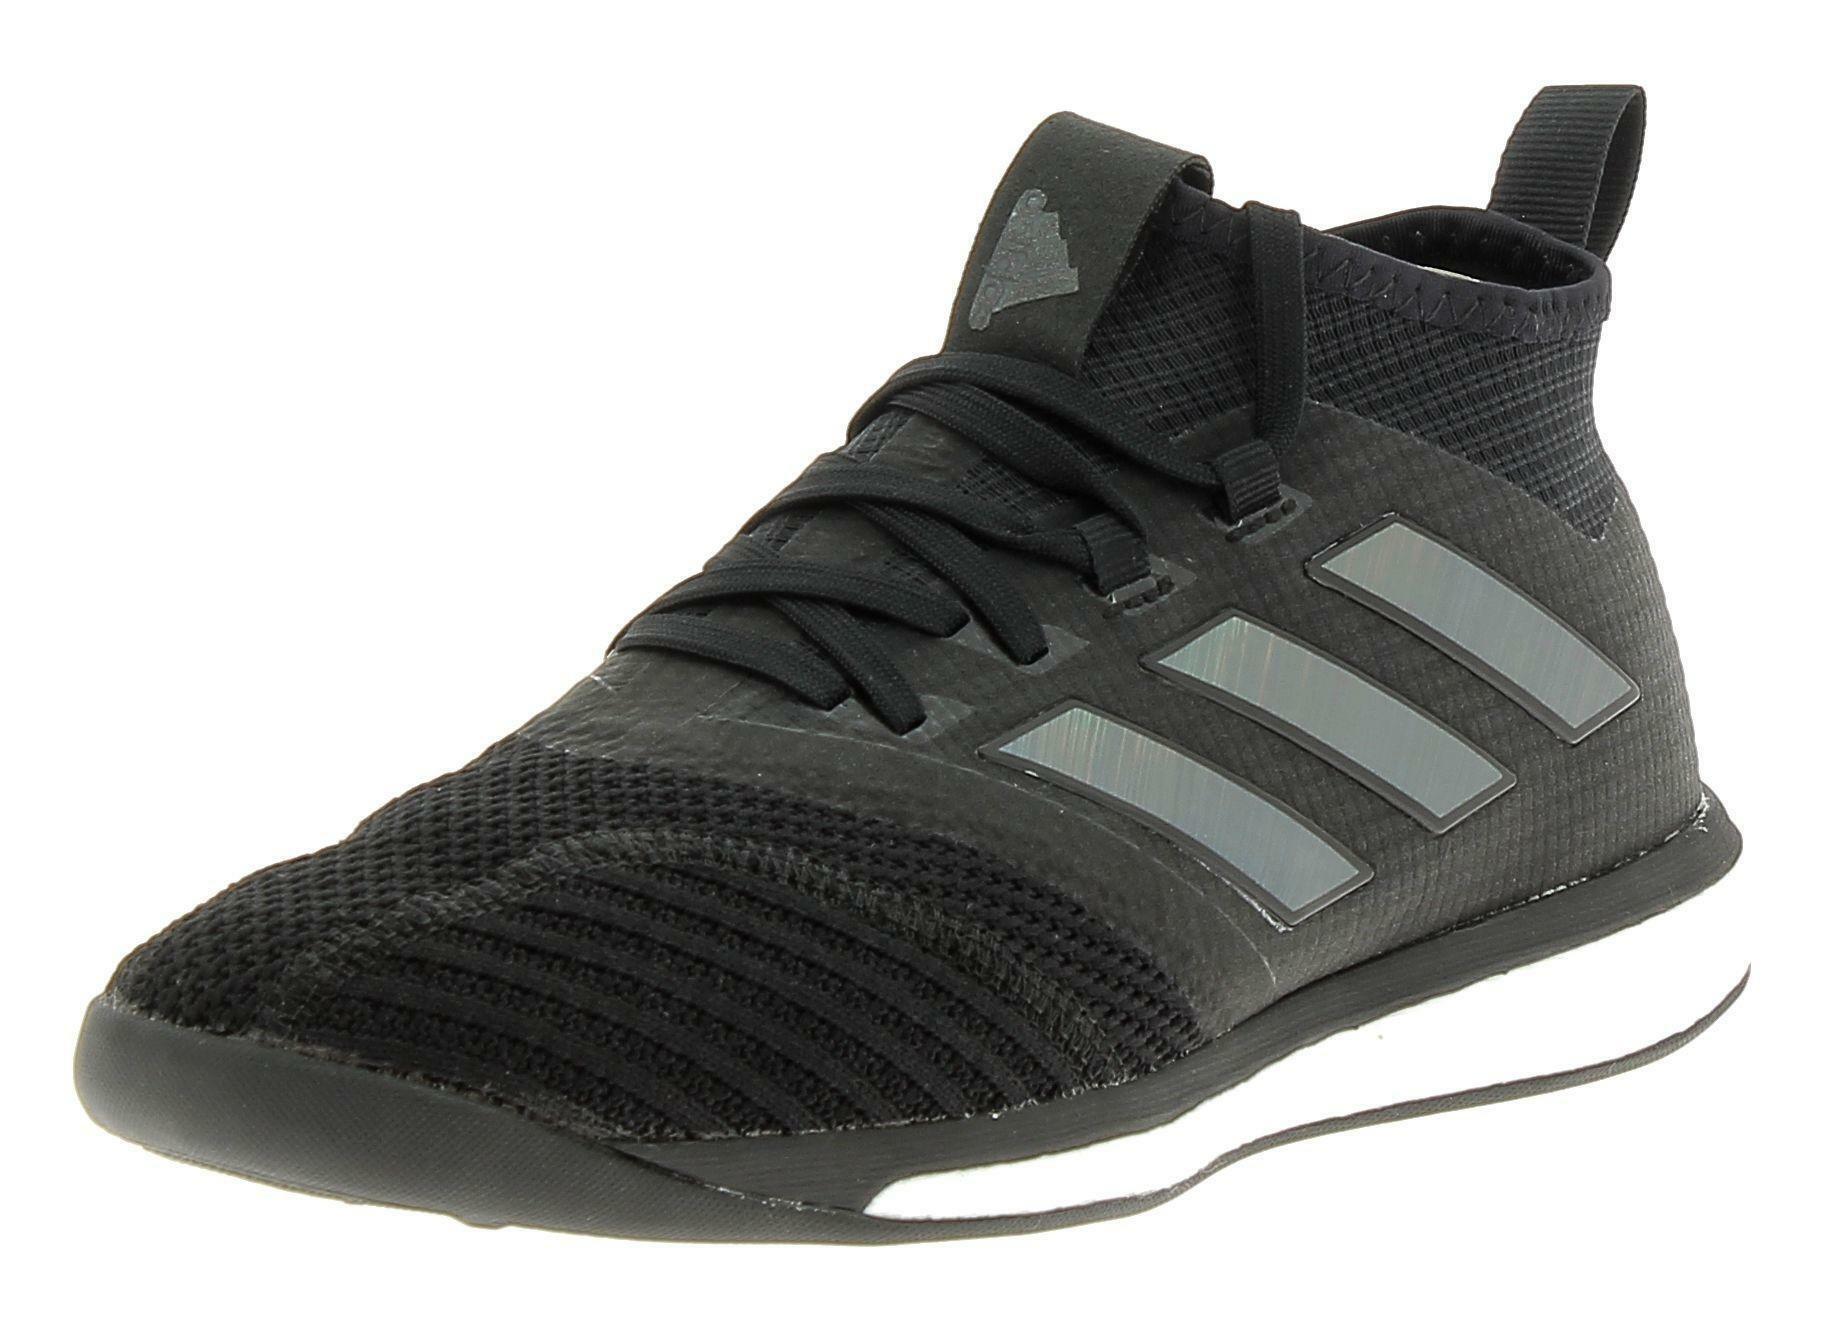 Details zu ADIDAS Ace Tango 17.1 Tr Boots Black Herren Fuballschuhe